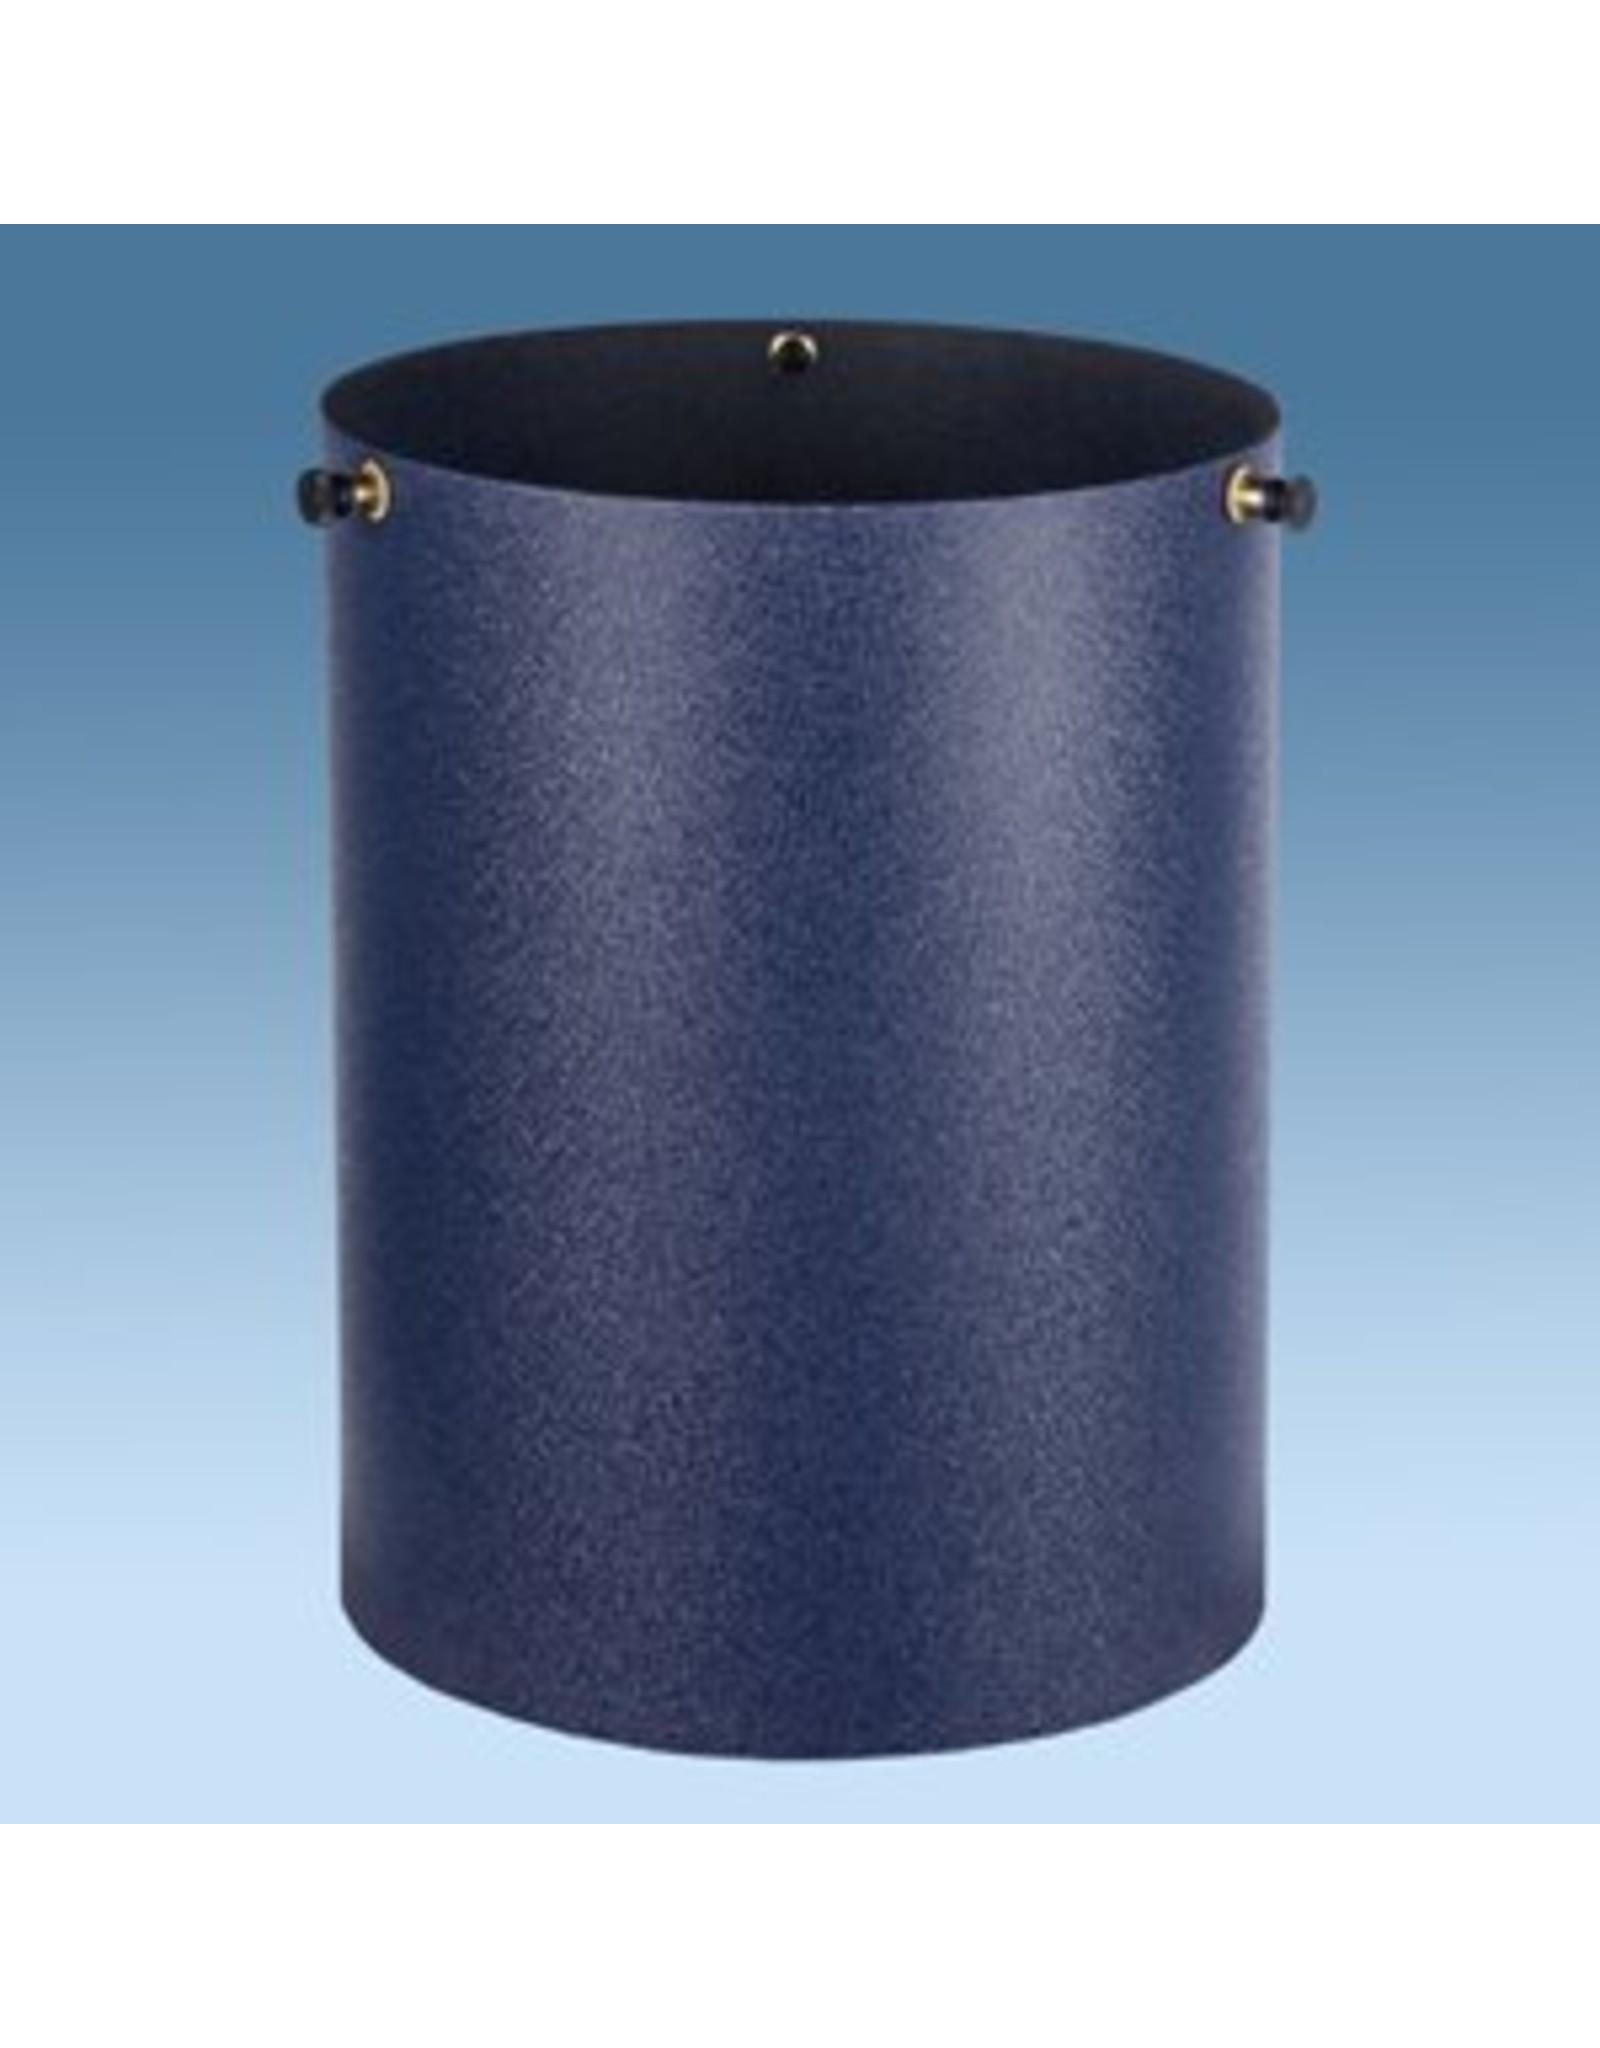 Astrozap Meade 8 SCT LX200-ACF & LX90 Aluminum Dew Shield